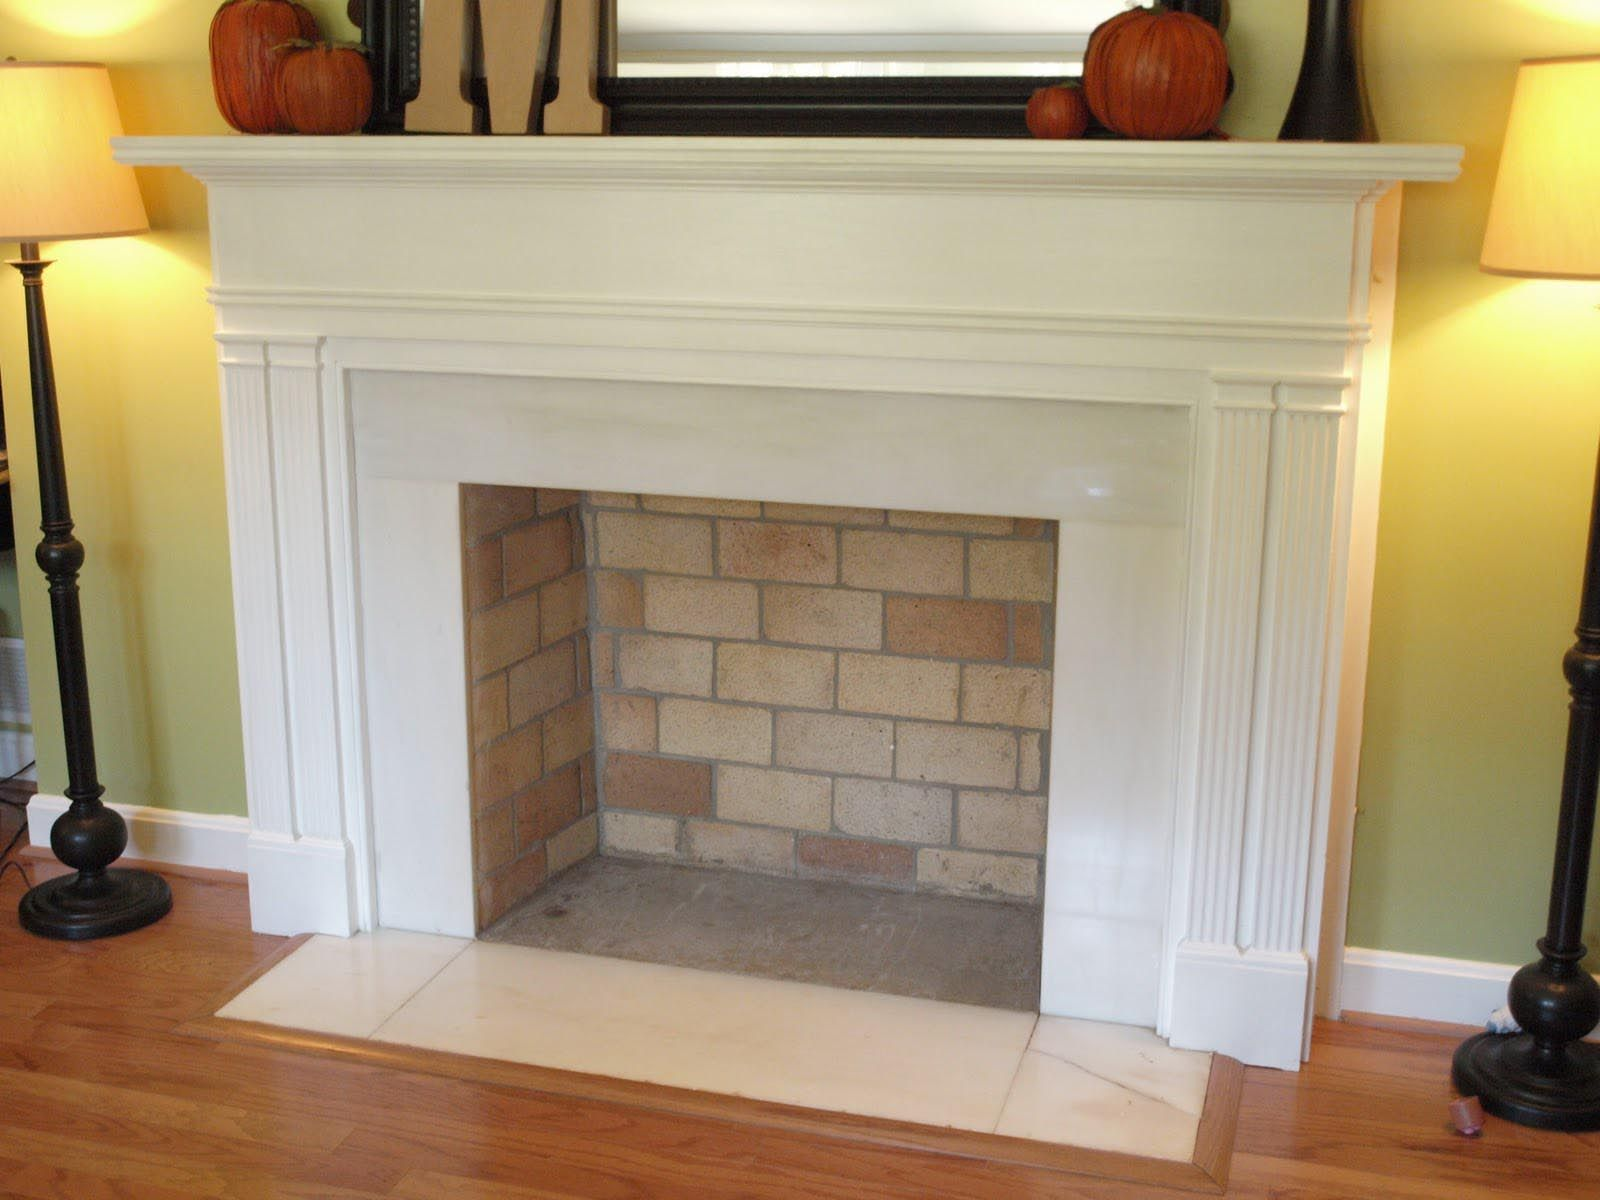 Faux Fireplace Inserts Fake Fireplace Cardboard Fireplace Faux Fireplace